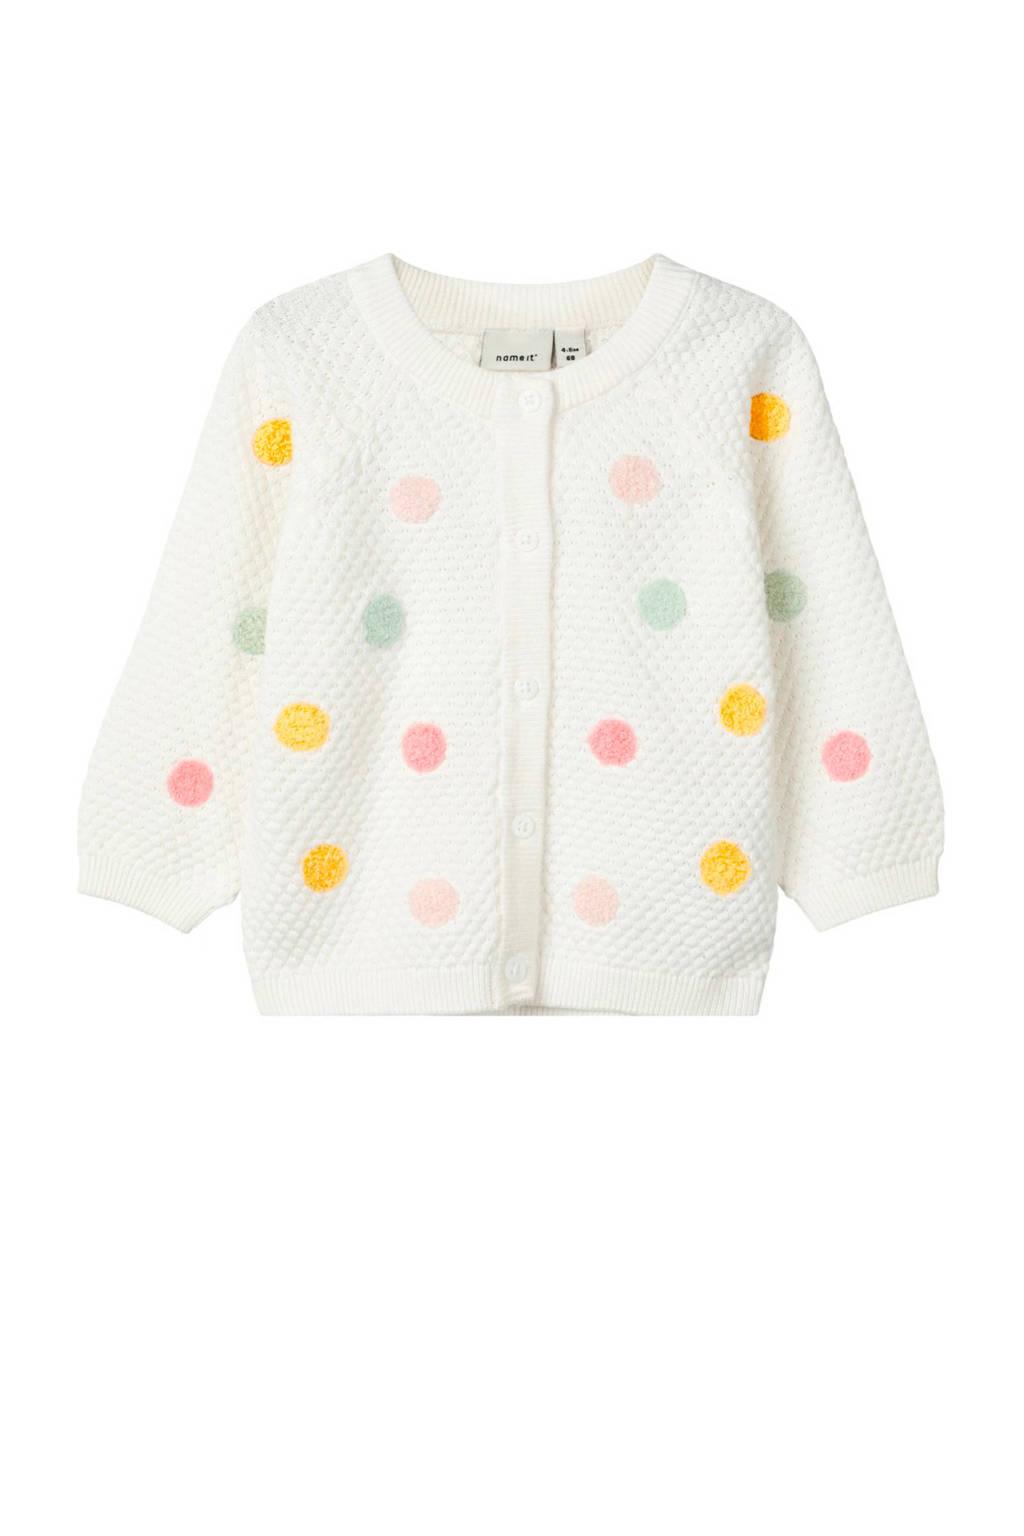 name it newborn baby vest Daddel, Wit